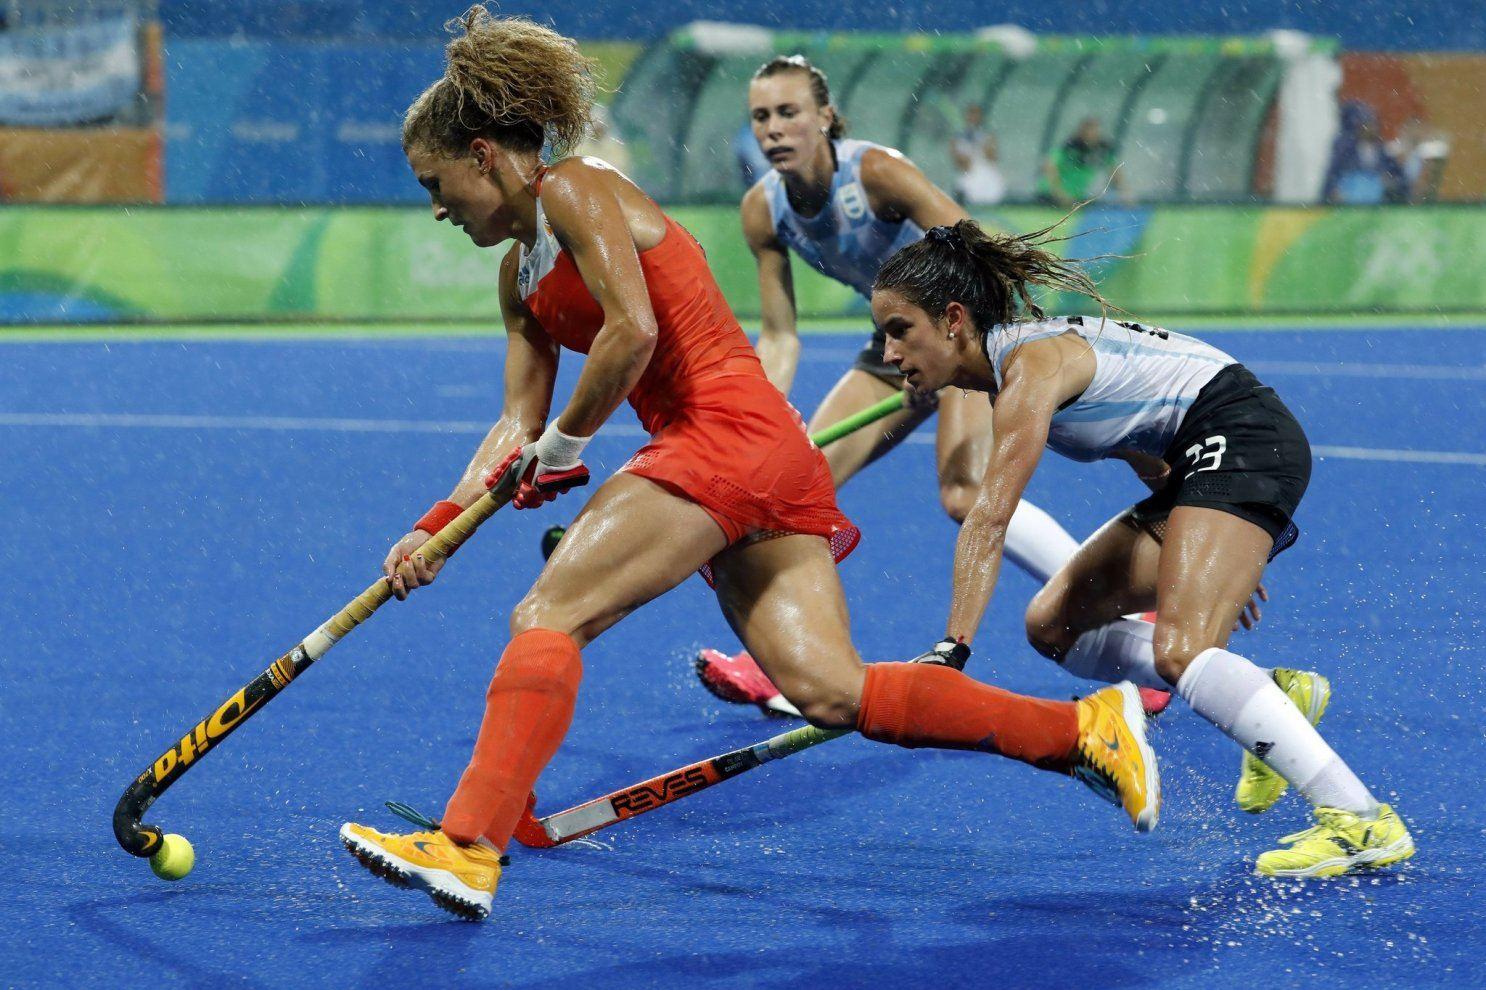 women's field hockey odds Olympics